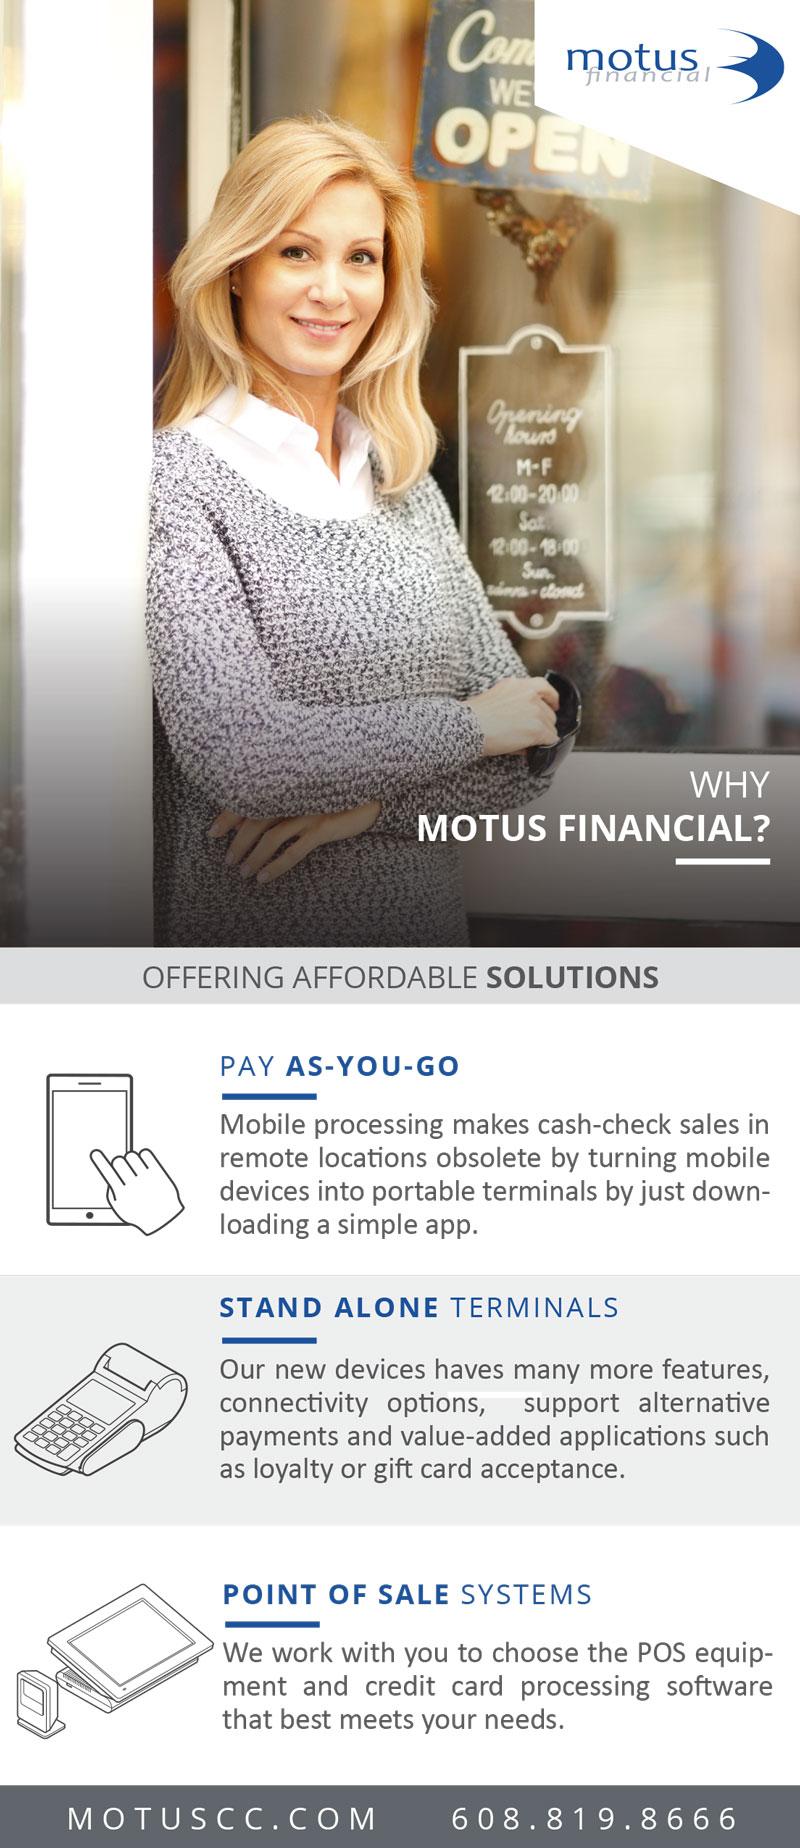 Motus Financial